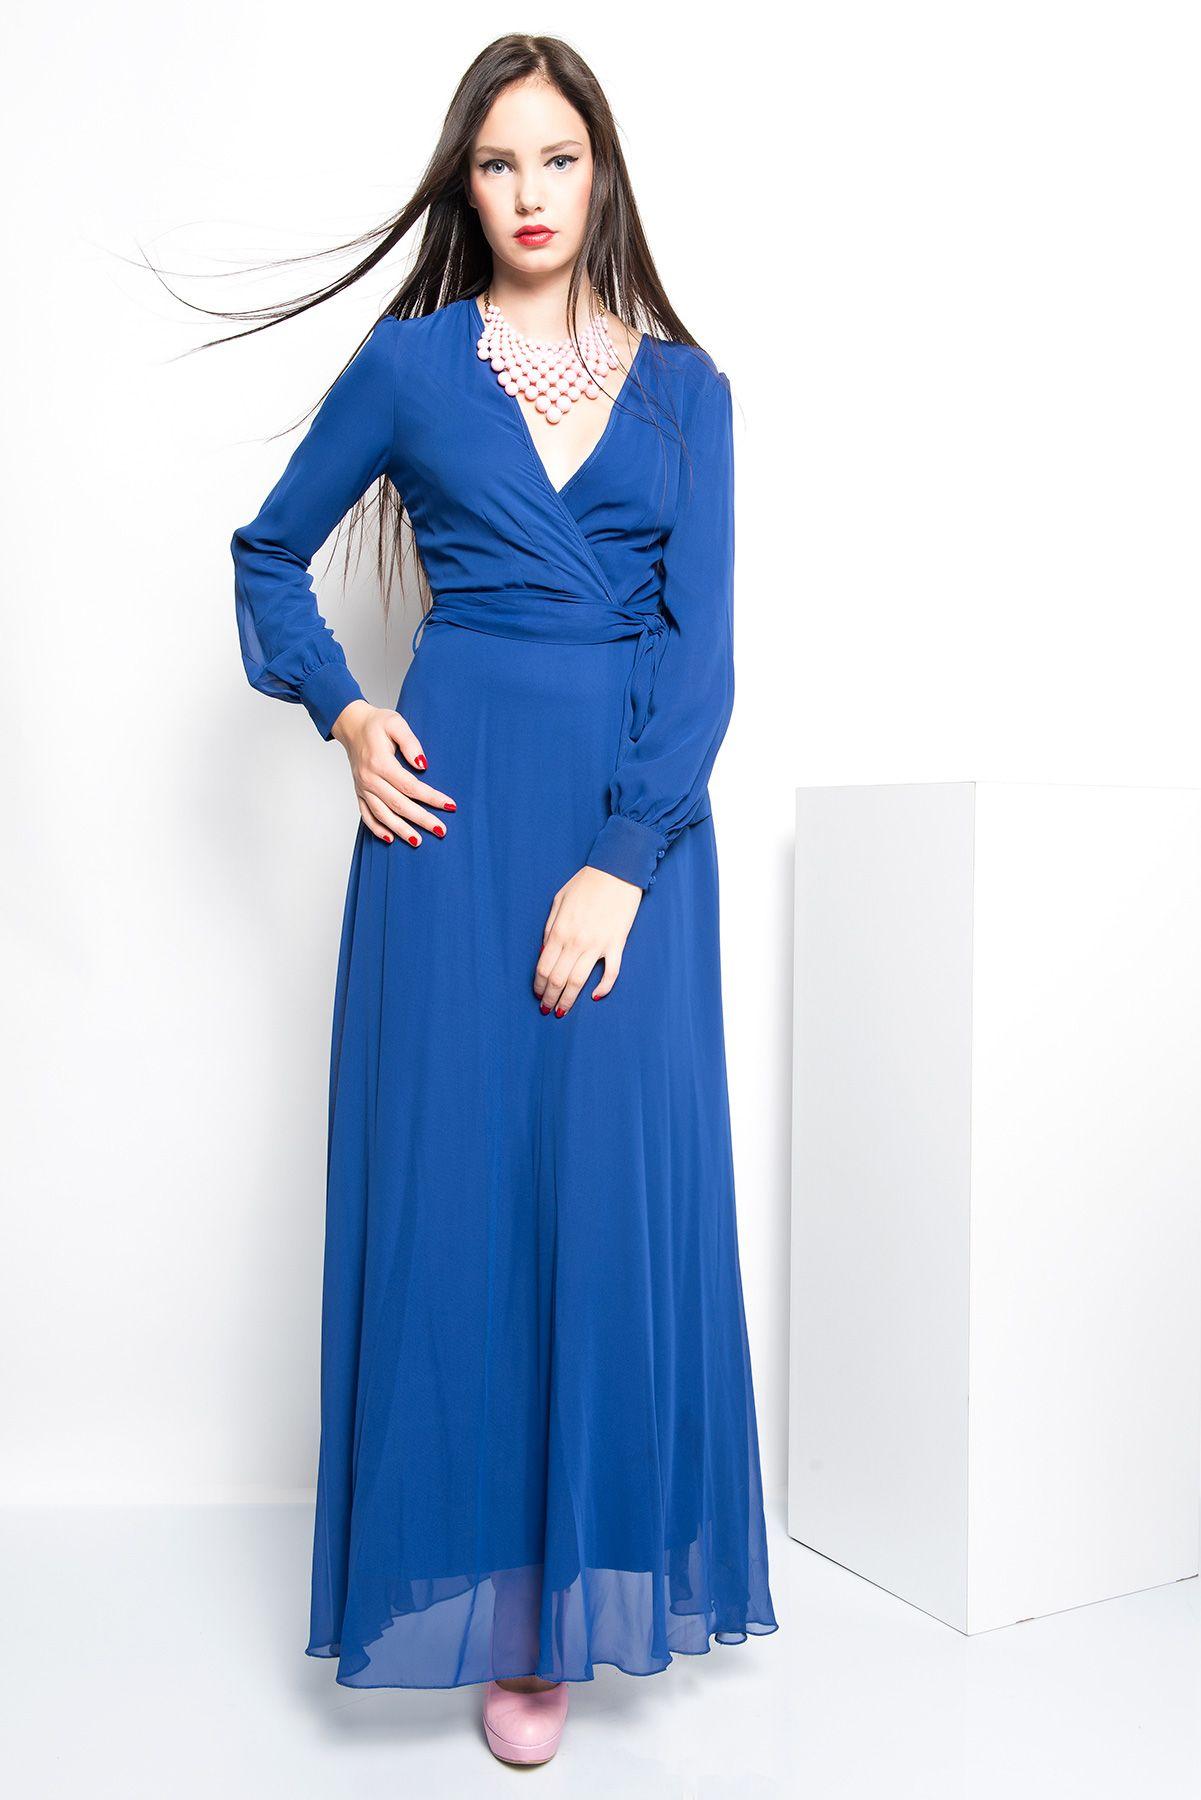 dd5f2f2199e16 İRONİ UZUN ŞİFON ELBİSE :: www.finansevim.com | Bayan Giyim | Giyim ...